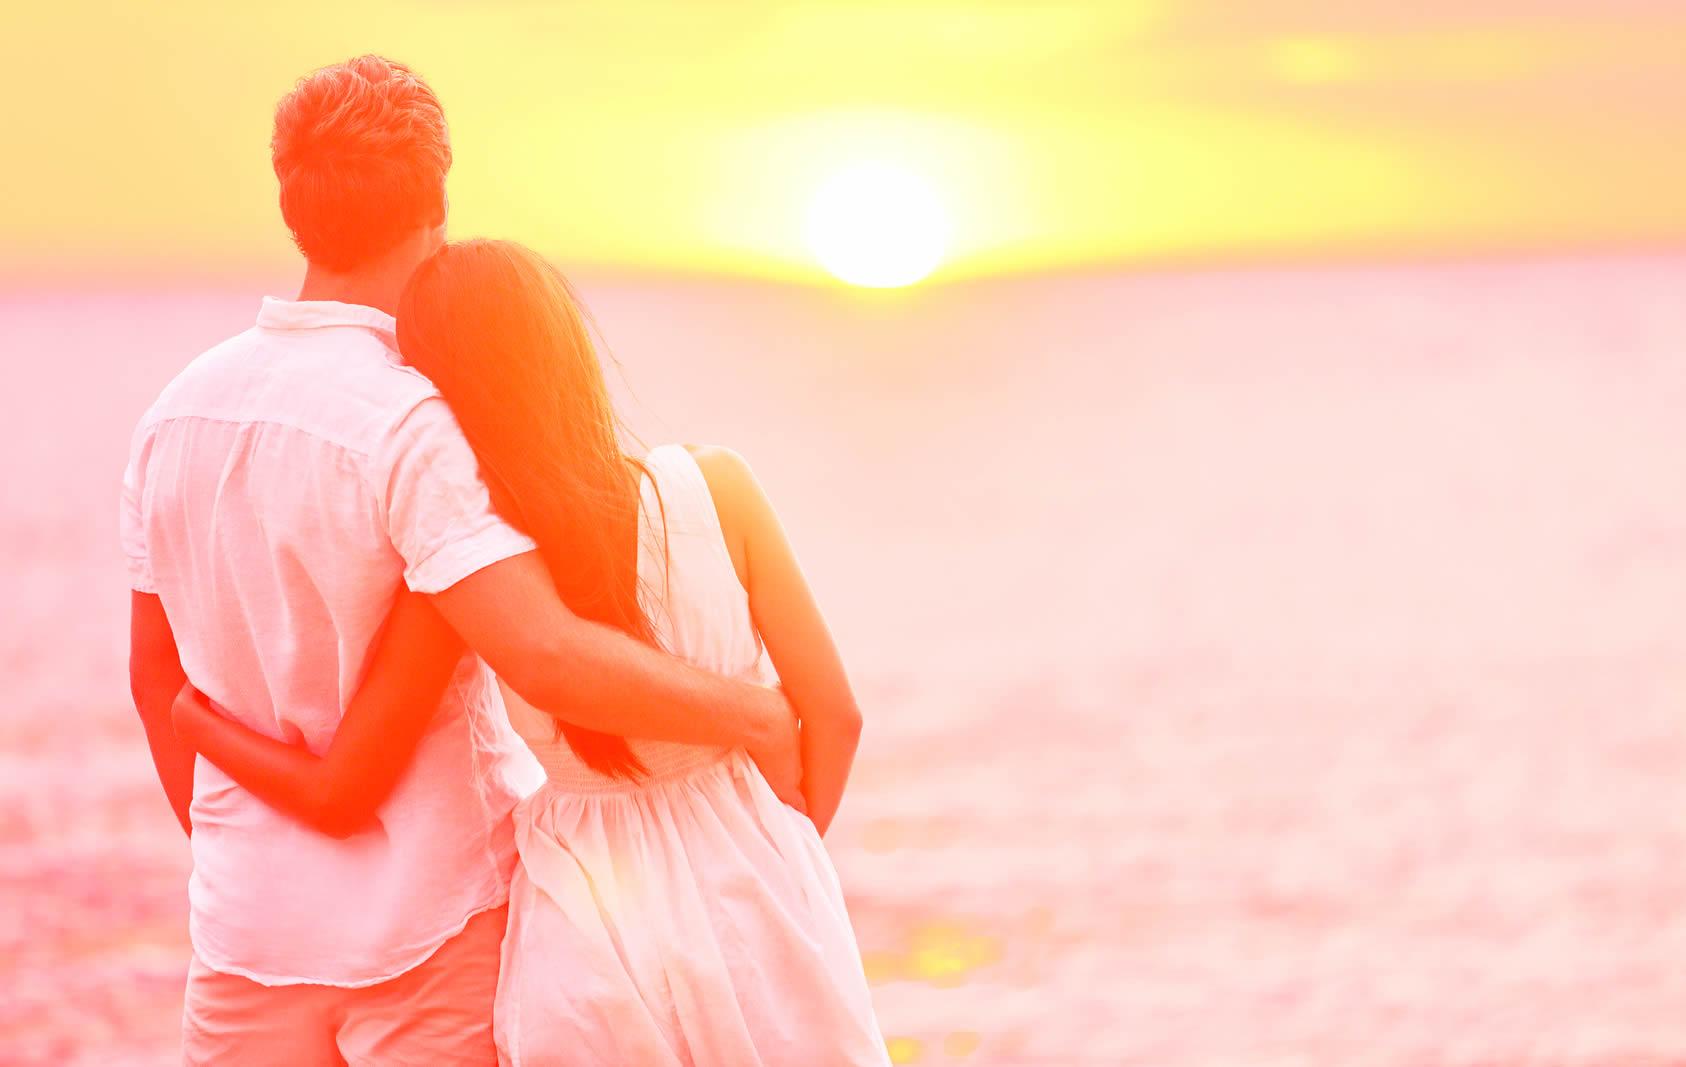 Cartas De San Valentin Las Mas Romanticas De Internet Shoshan